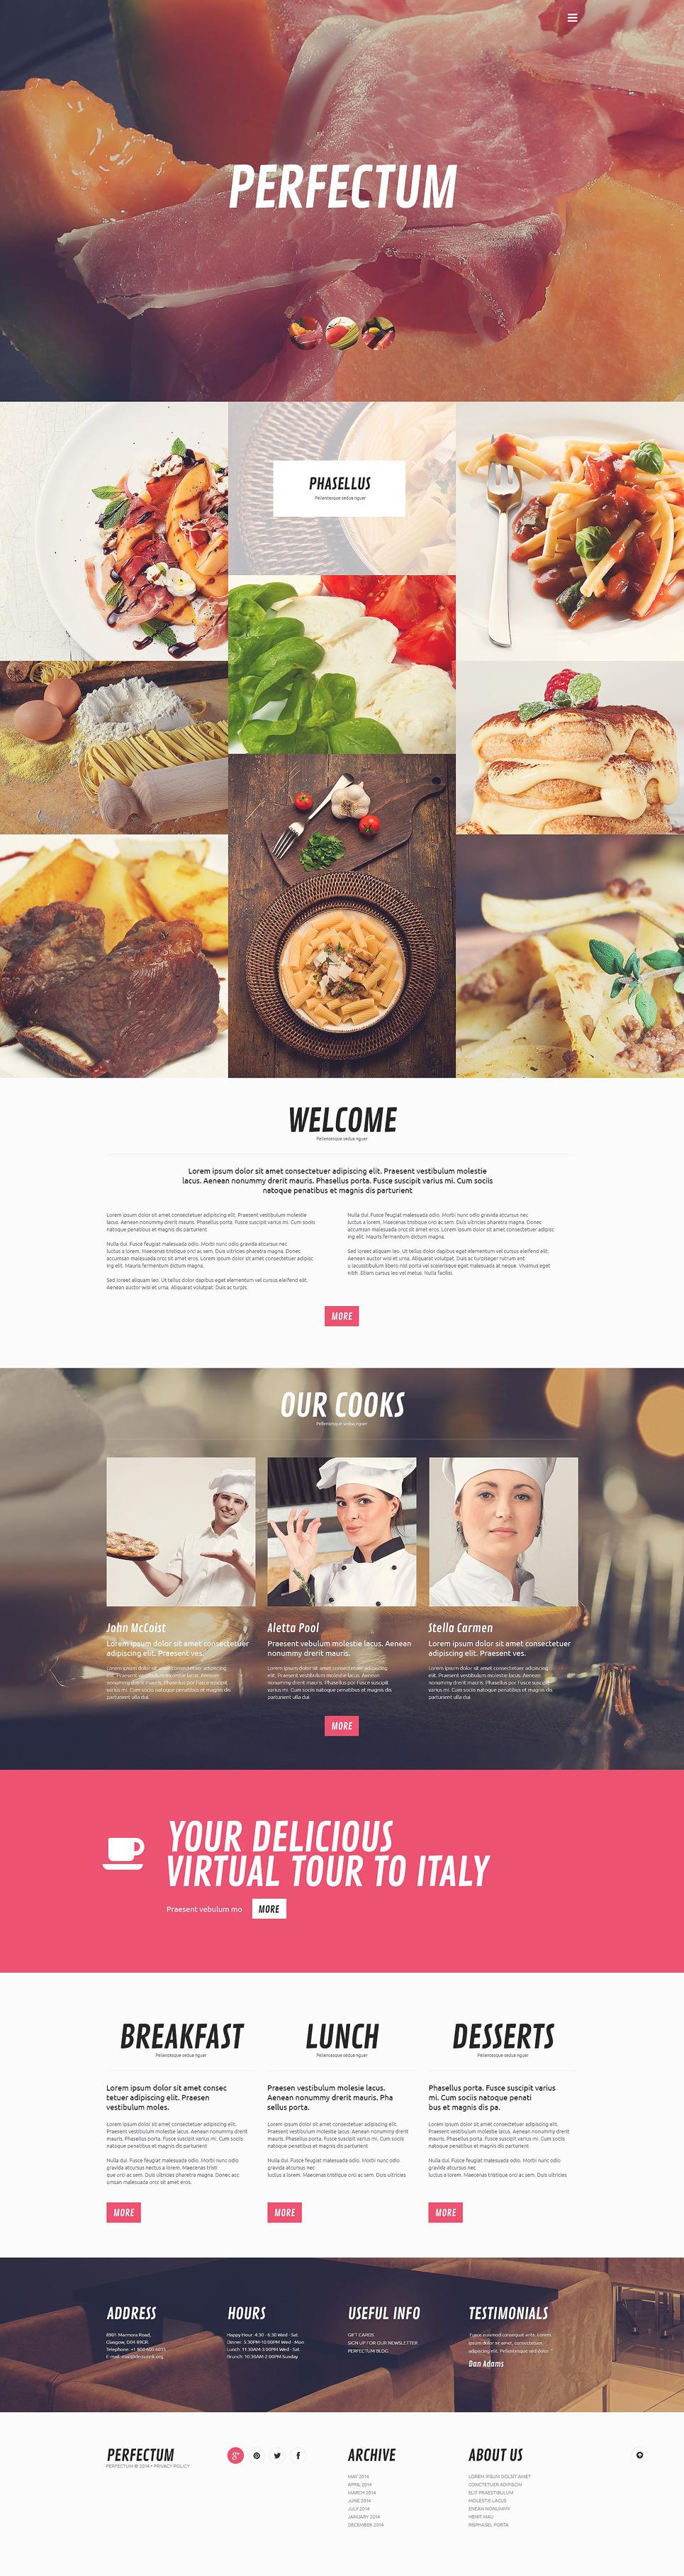 Адаптивный шаблон сайта на тему европейский ресторан #52443